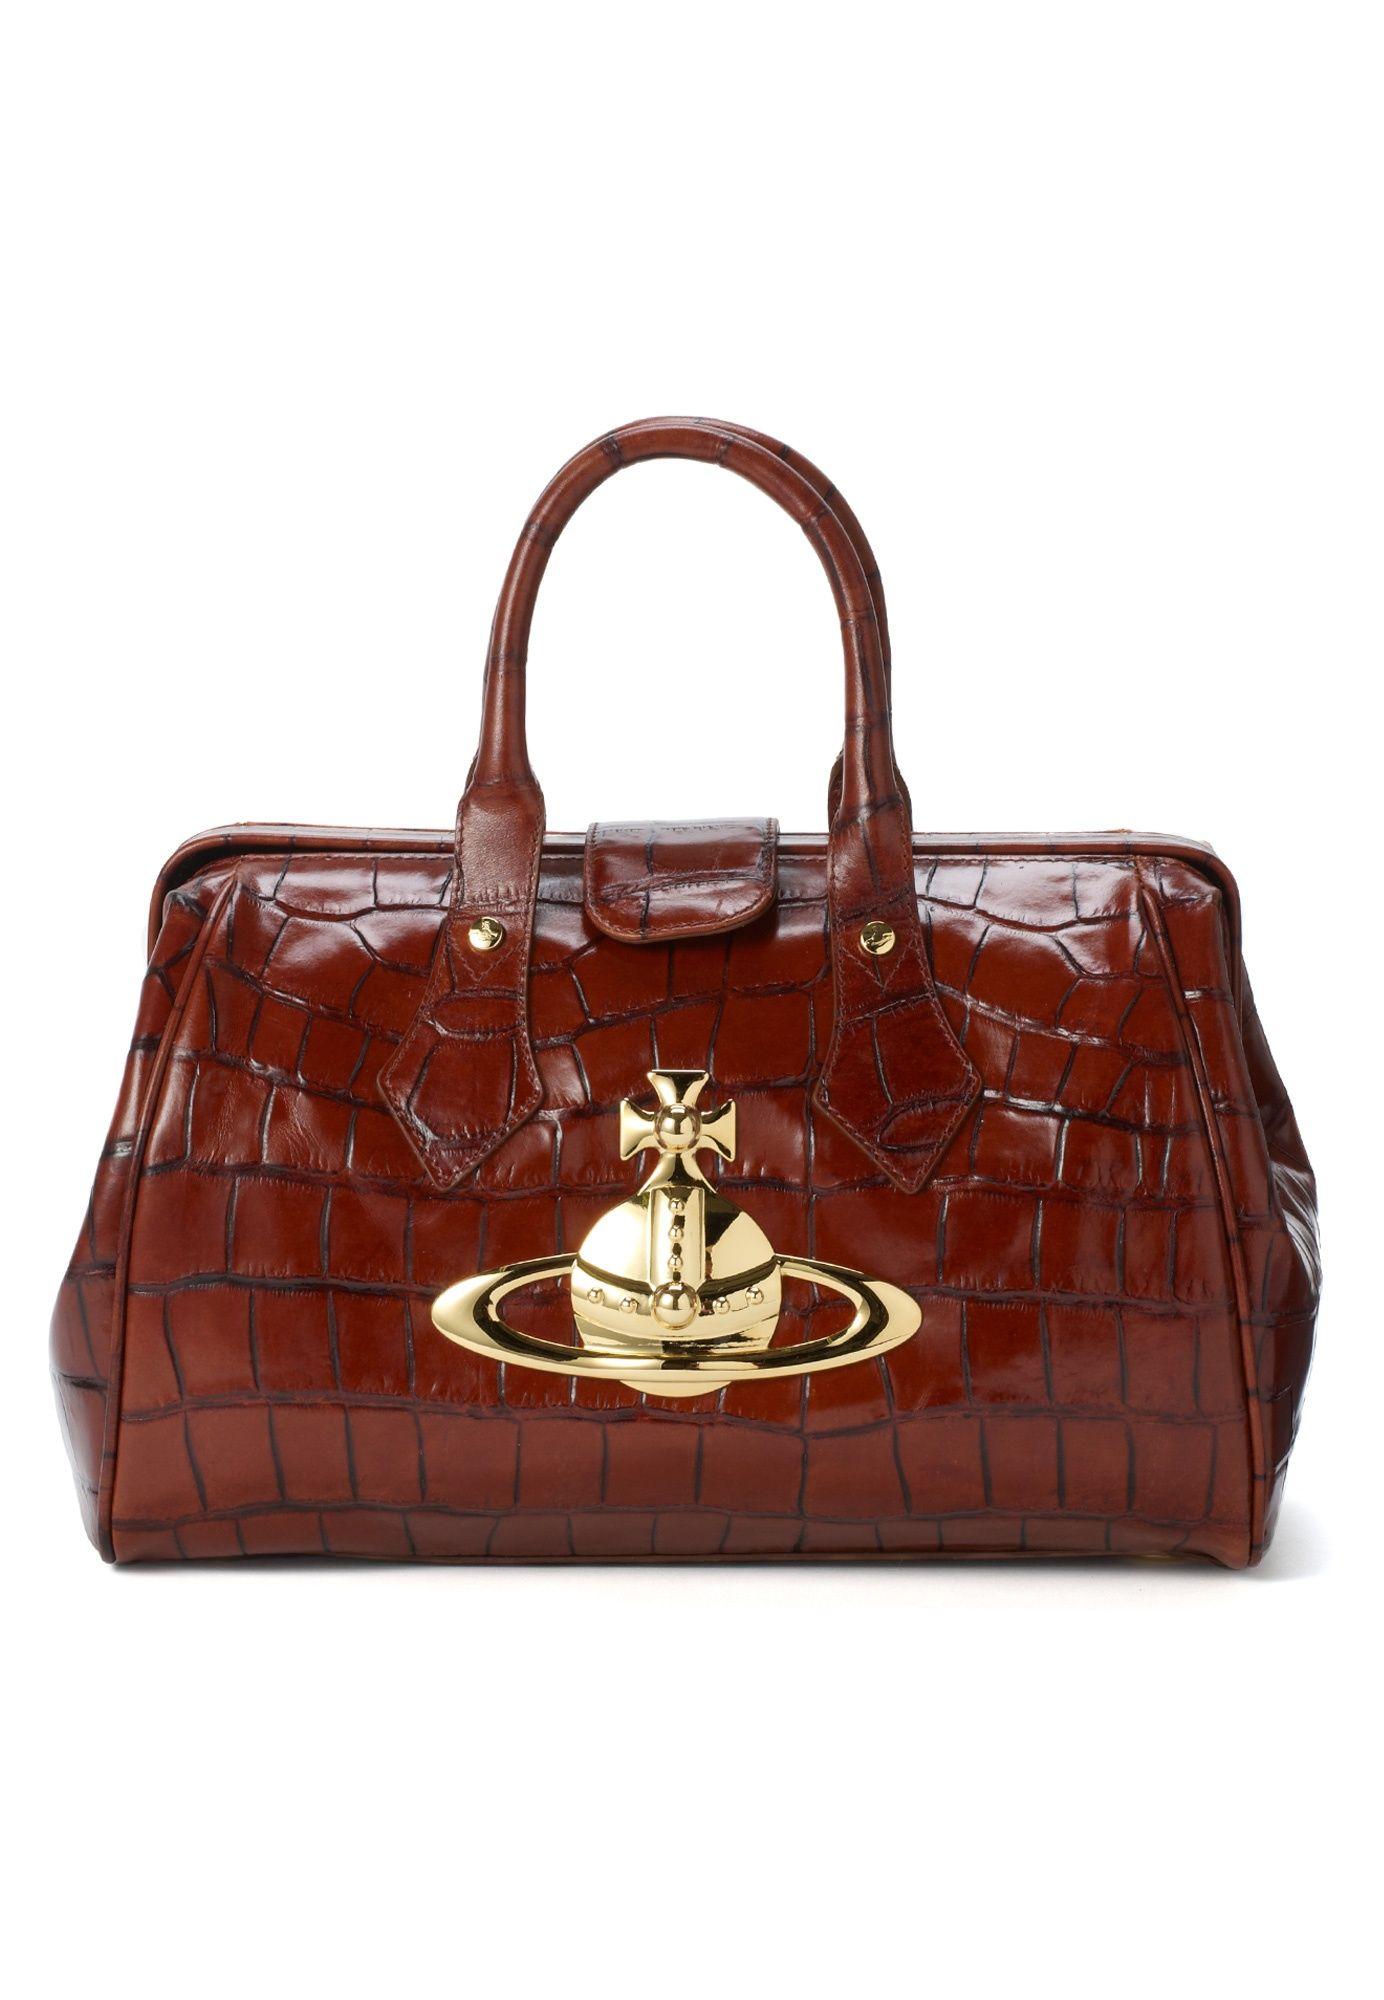 b3e9b89d80 Vivienne Westwood - Classic Orb Bag Brown   style: shoes & bags ...